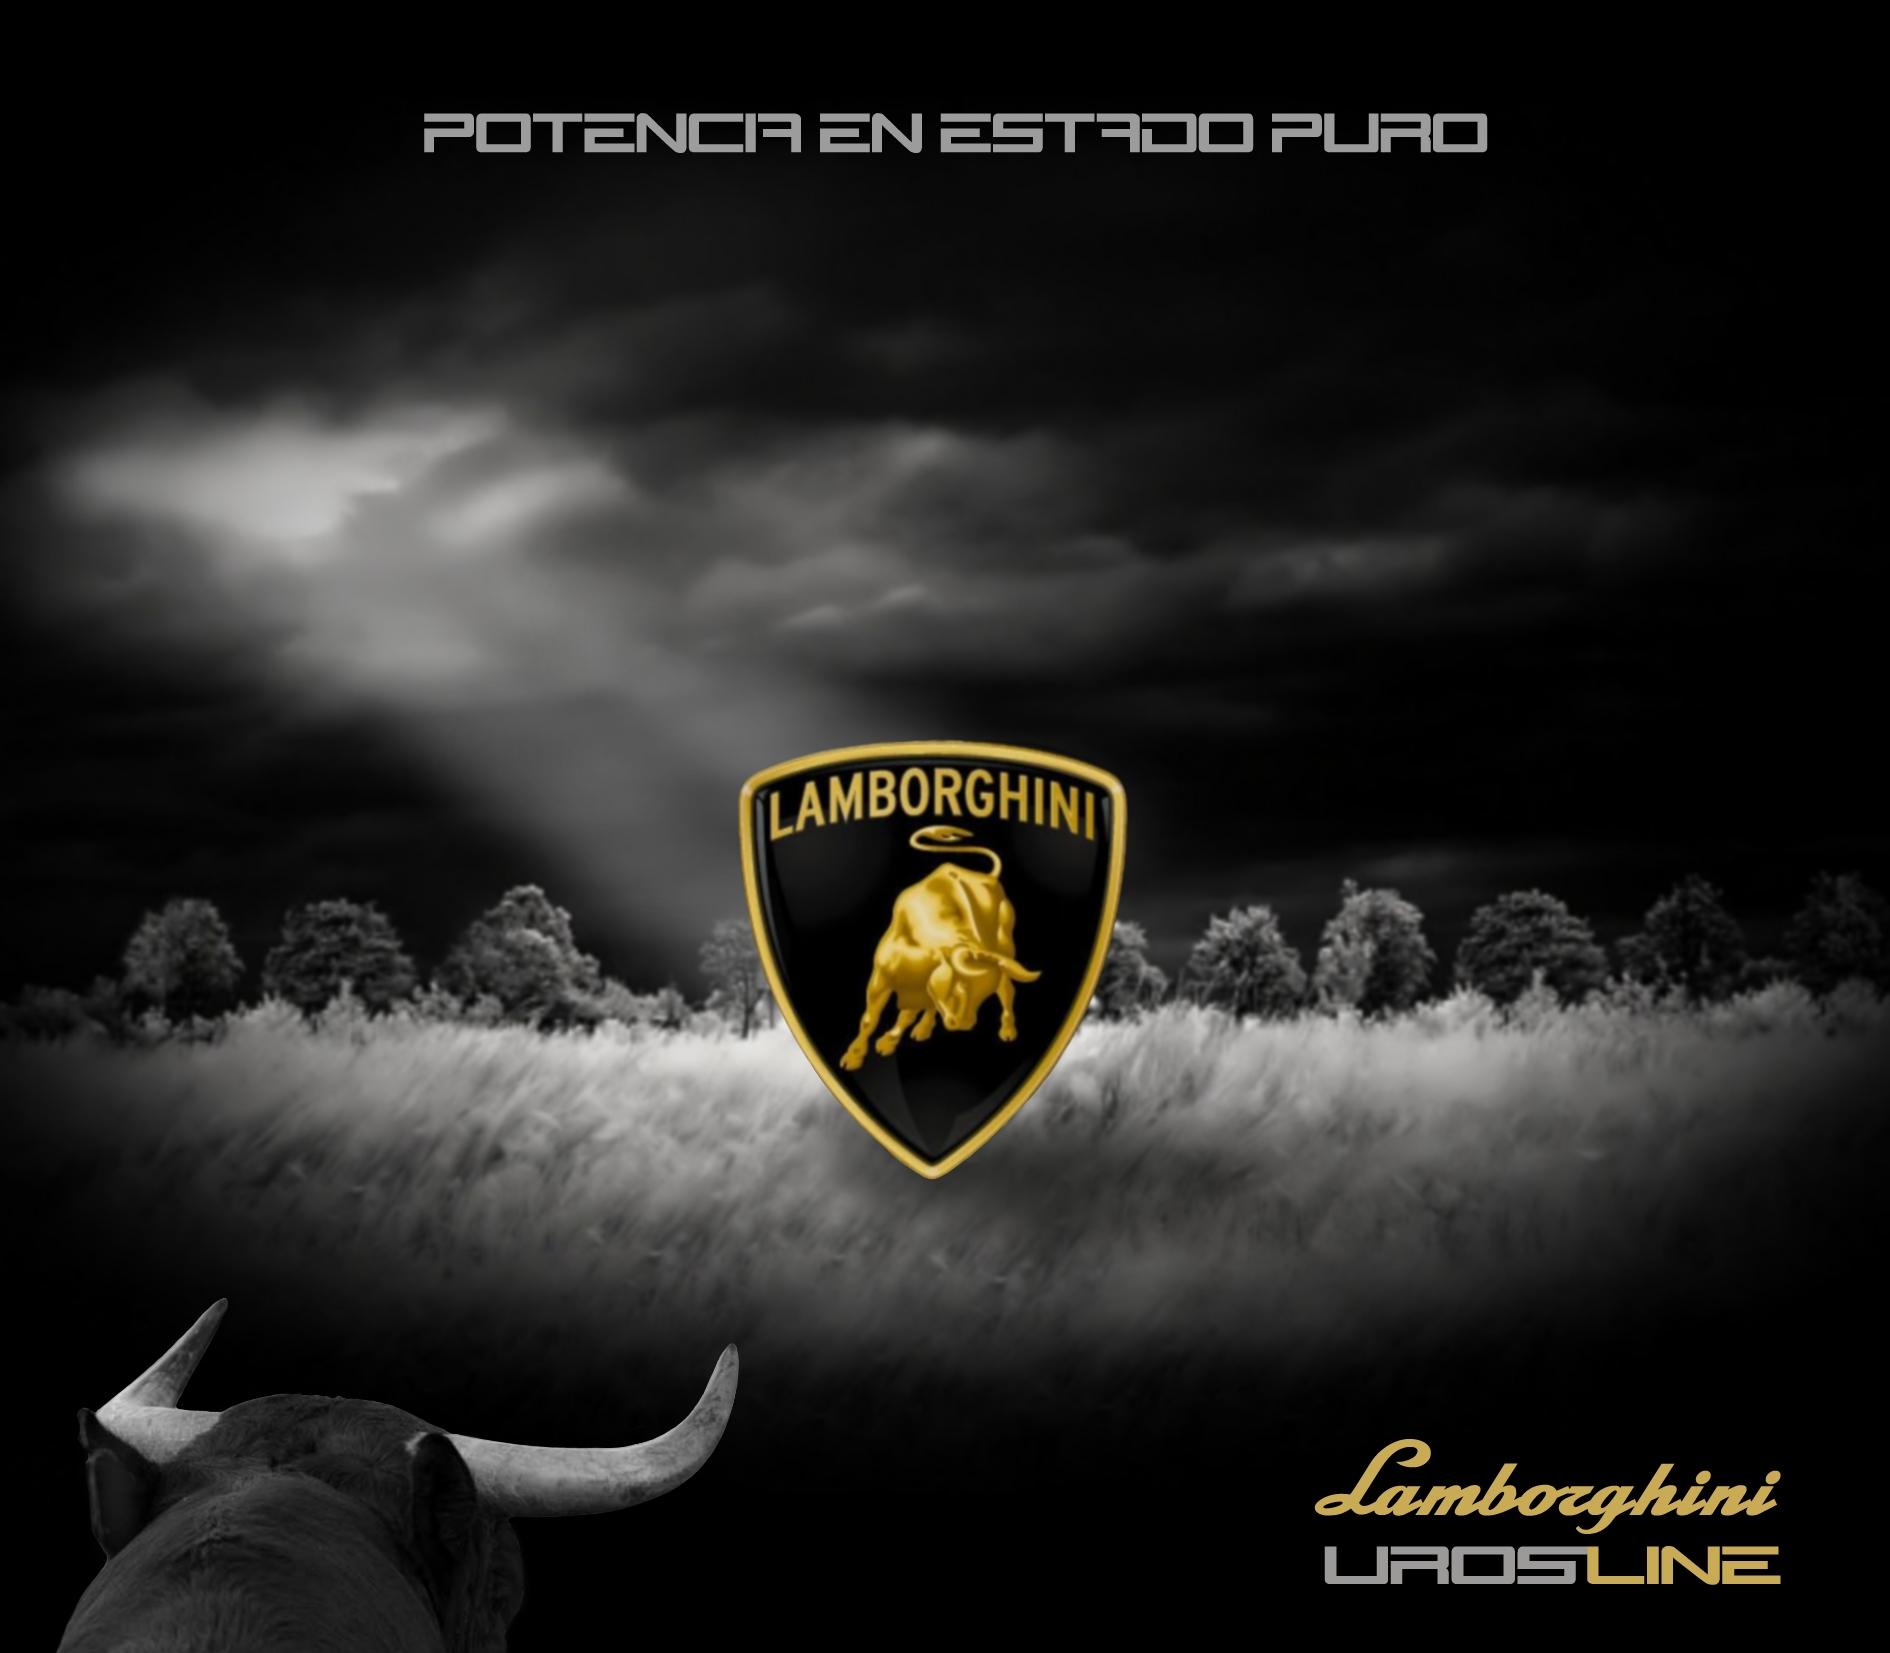 Lamborghini logo wallpaper wallpapersafari - Lamborghini symbol wallpaper ...